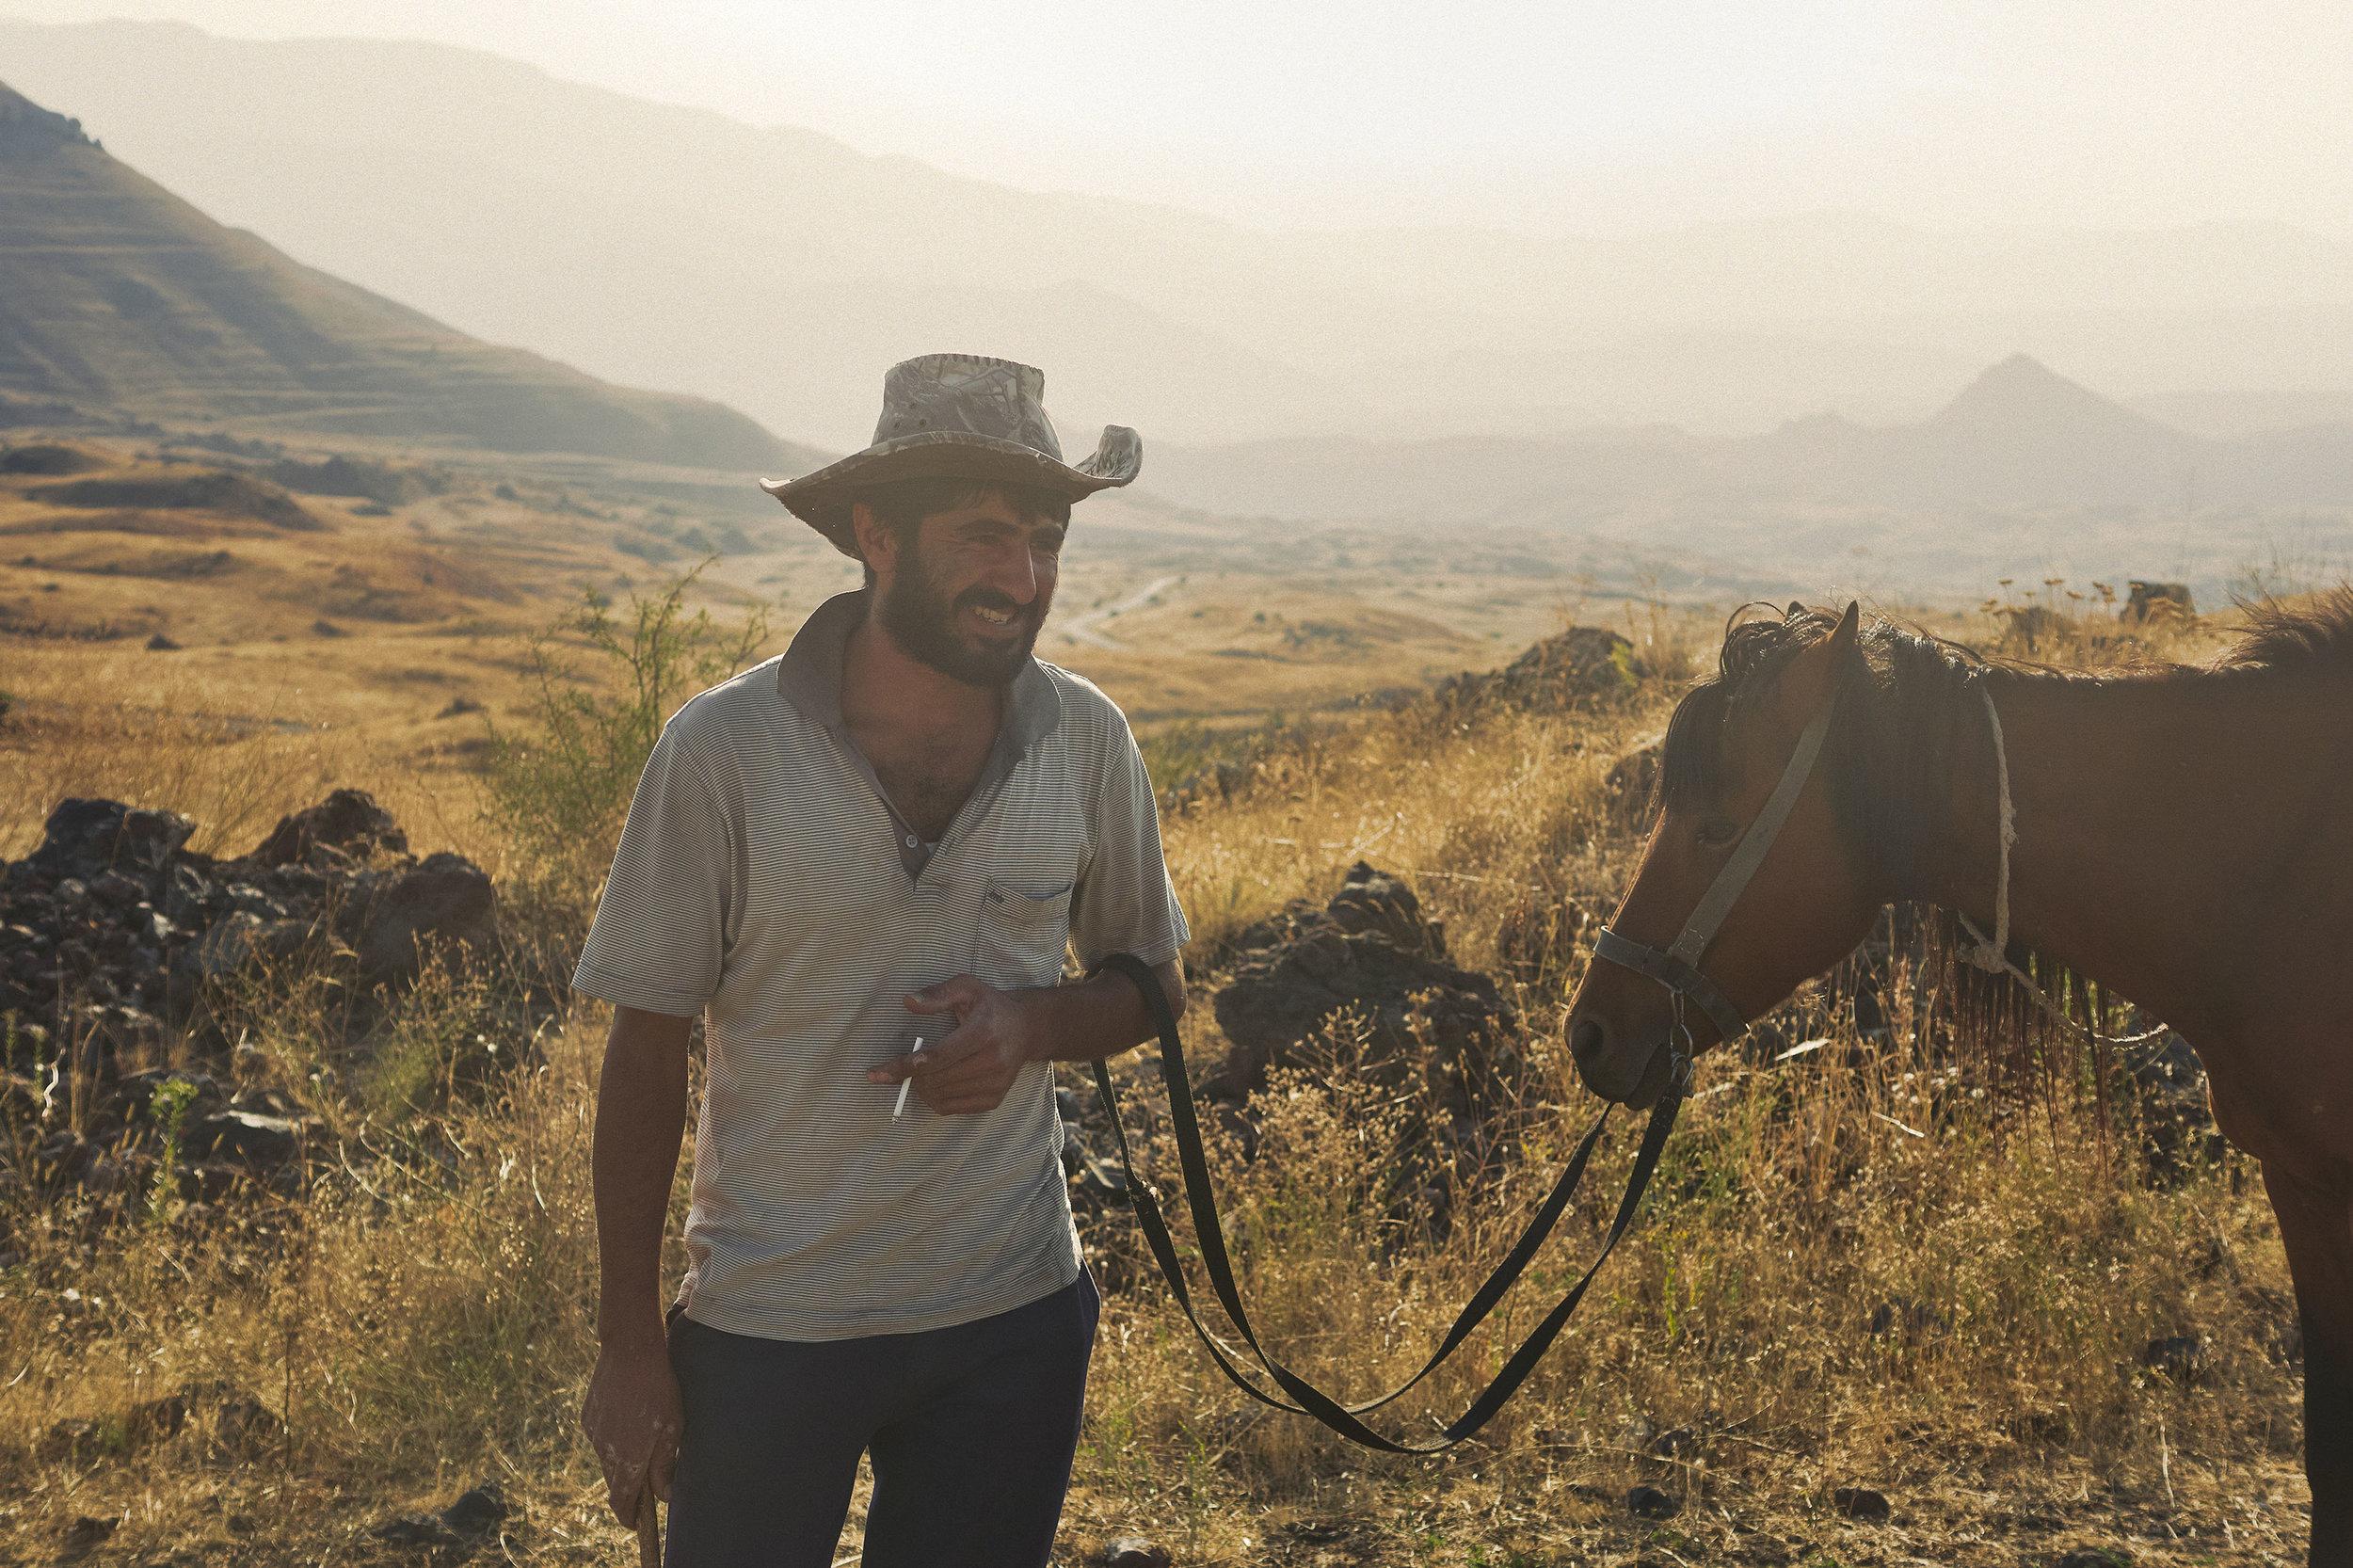 Armenia-Vayots-Zar-man-with-horse